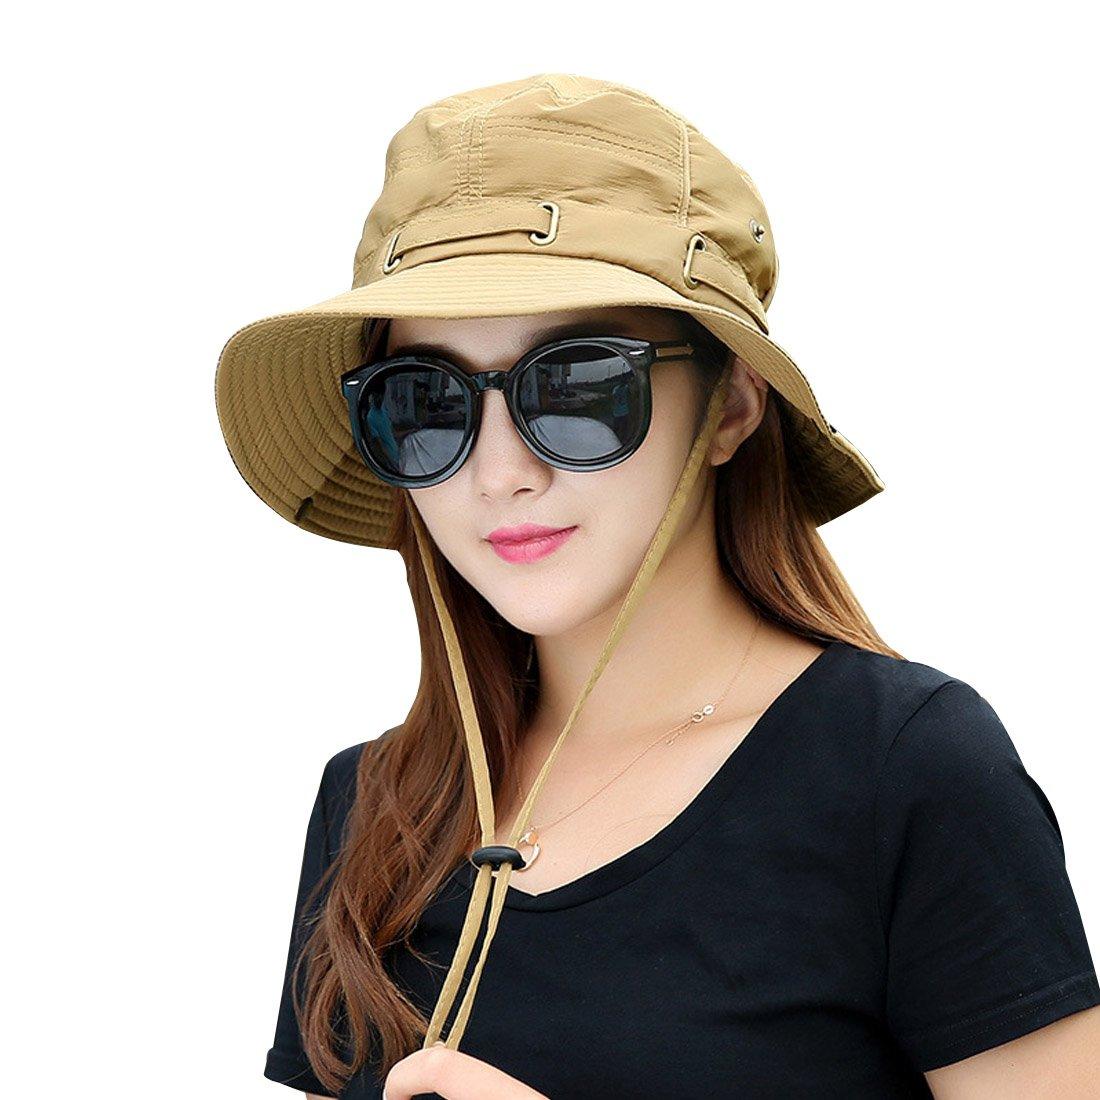 Kafeimali Summer Sun Men/Women Wide Brim UV Beach Caps Sports fishing Hats (Yellow)